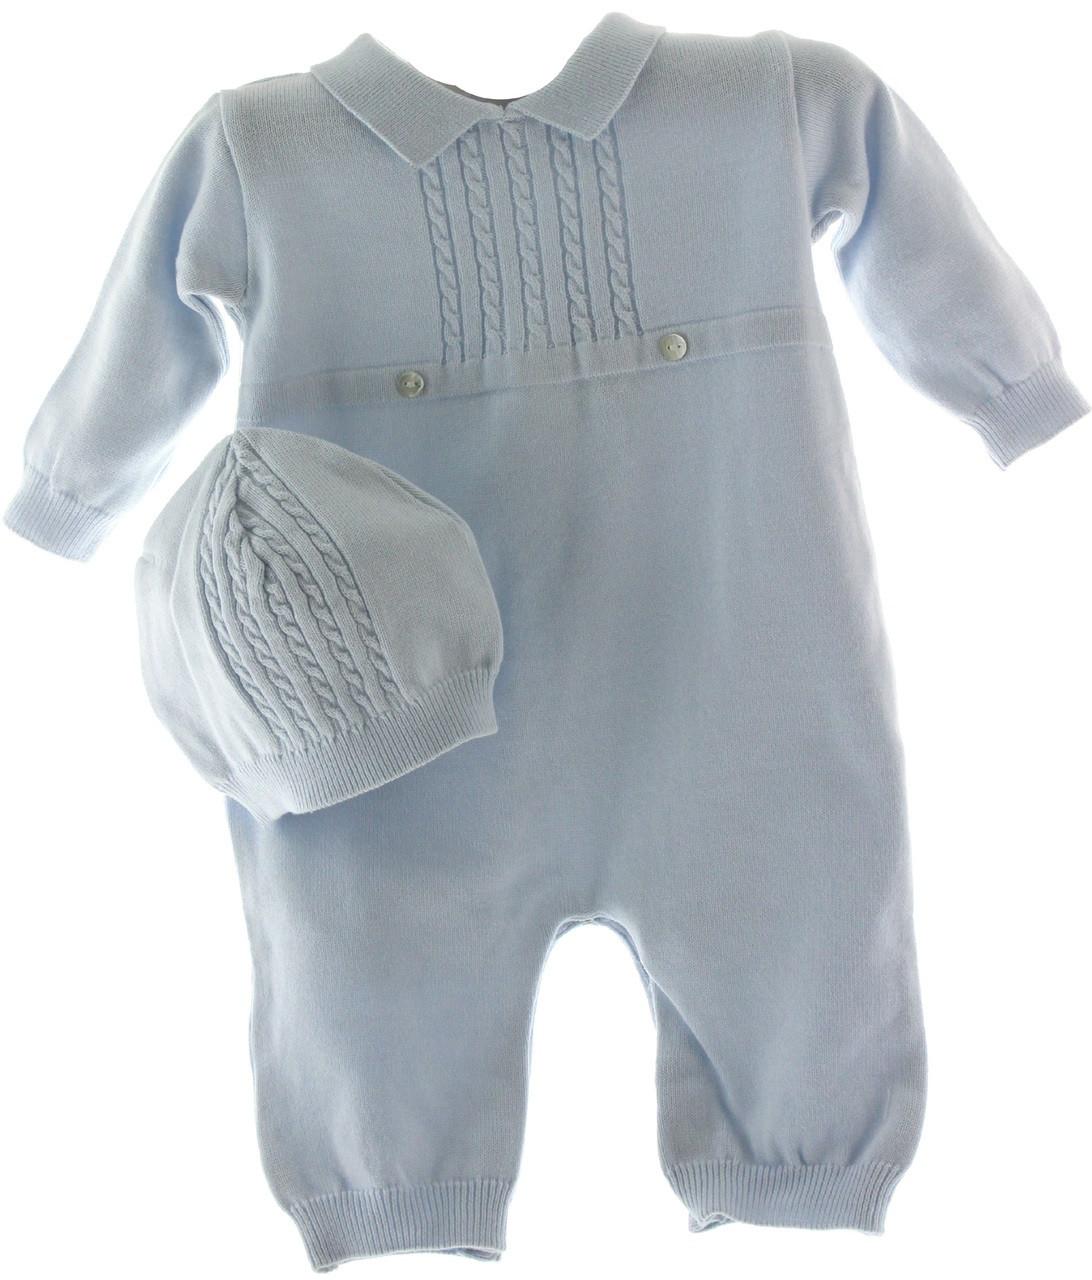 0f66ccc351ba6 Baby Boys Blue Knit Long Sleeve Romper & Hat Set | Knit Layette Sets